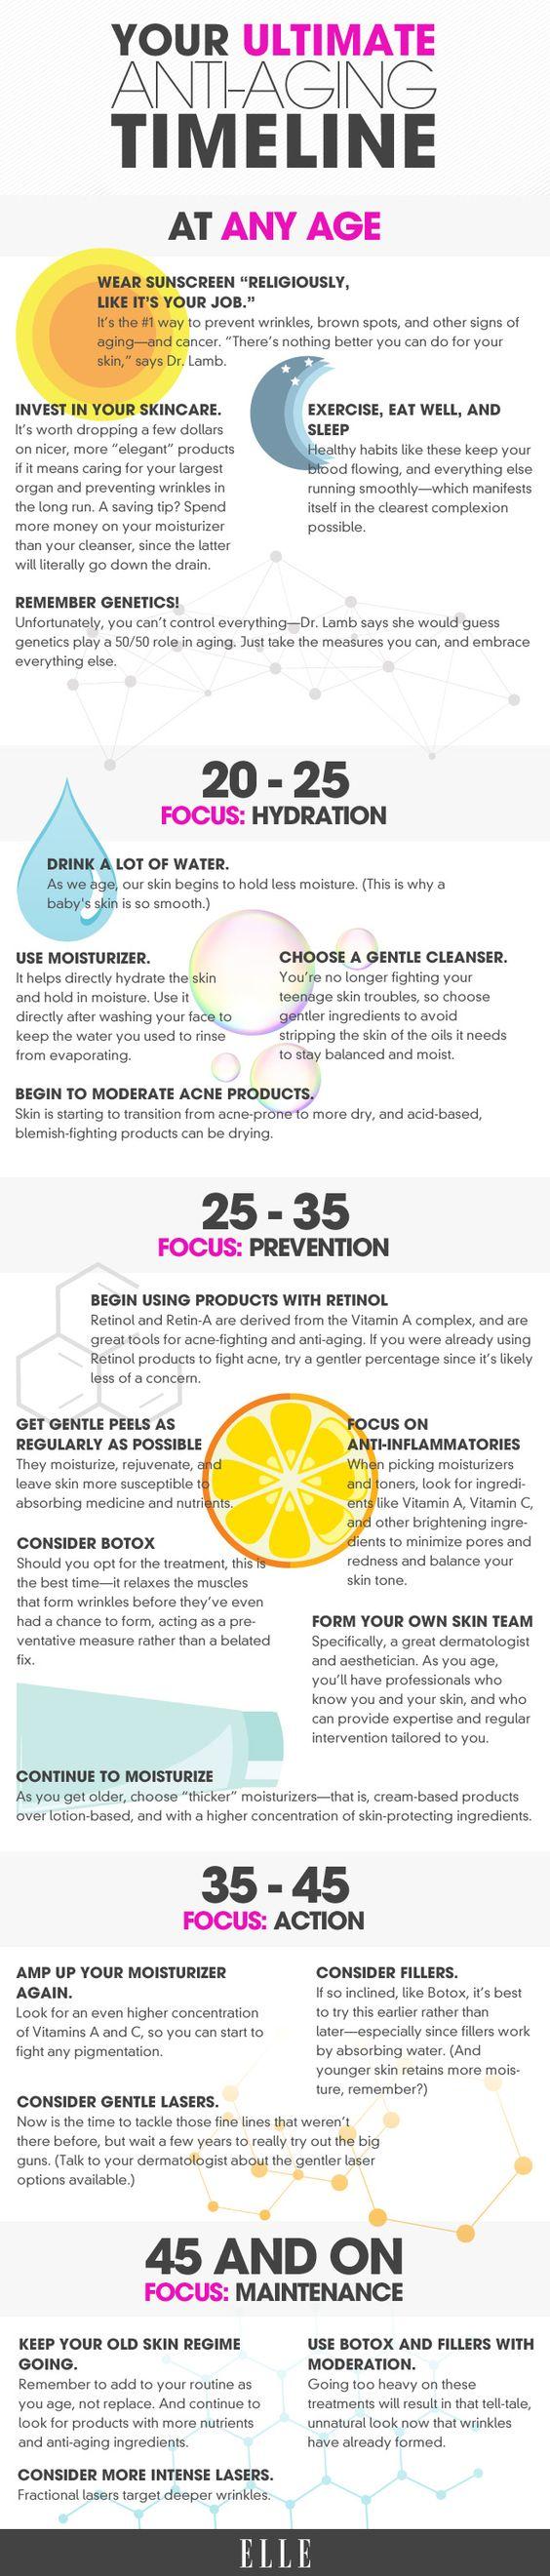 Anti-Aging Skincare Guide for Every Age - Preventative Skincare Infographic - Elle http://dermdocs.com/